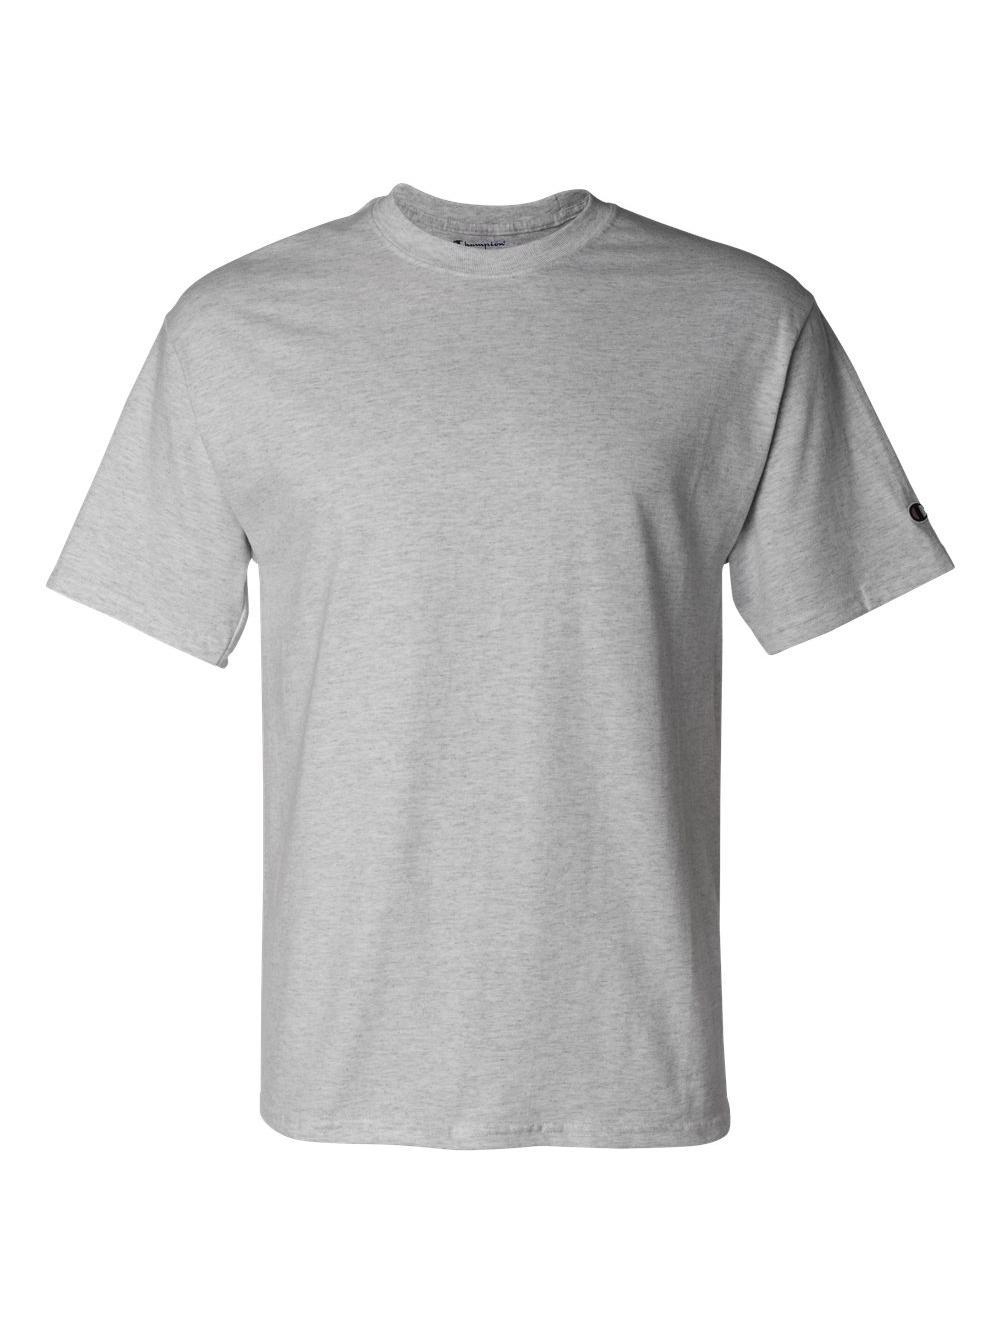 Champion-Short-Sleeve-T-Shirt-T425 thumbnail 18